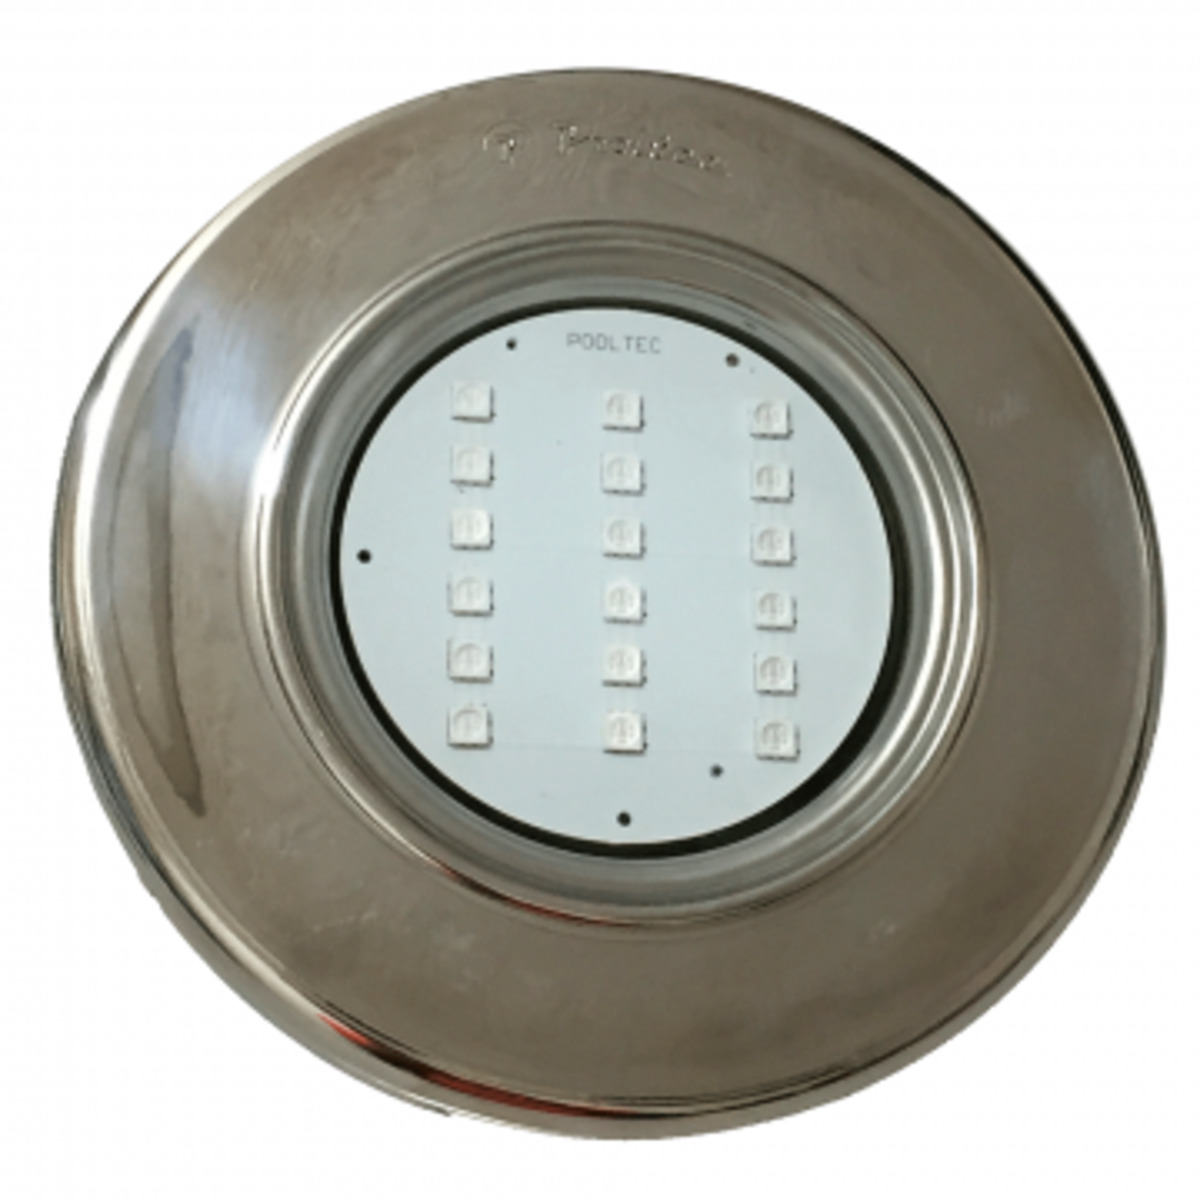 "Refletor RGB Steel Led SMD 18 Inox com Plug 1/2"" Pooltec"